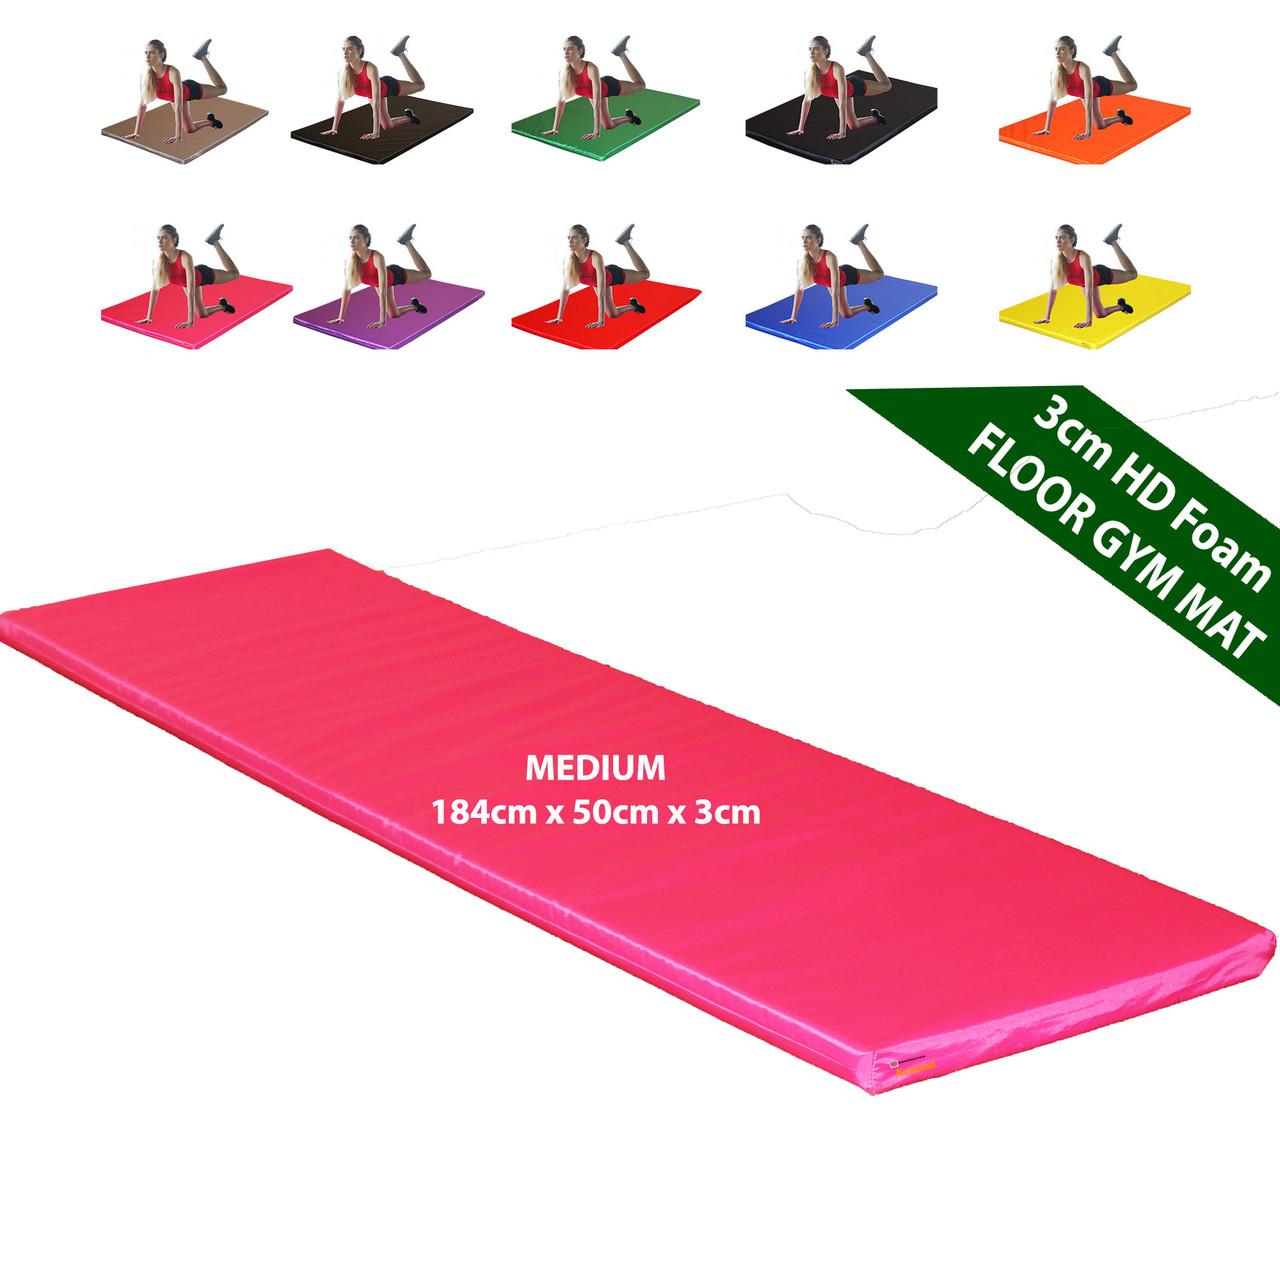 Kosipad 3cm Thick foam floor gym crash mats Orange Blue Medium